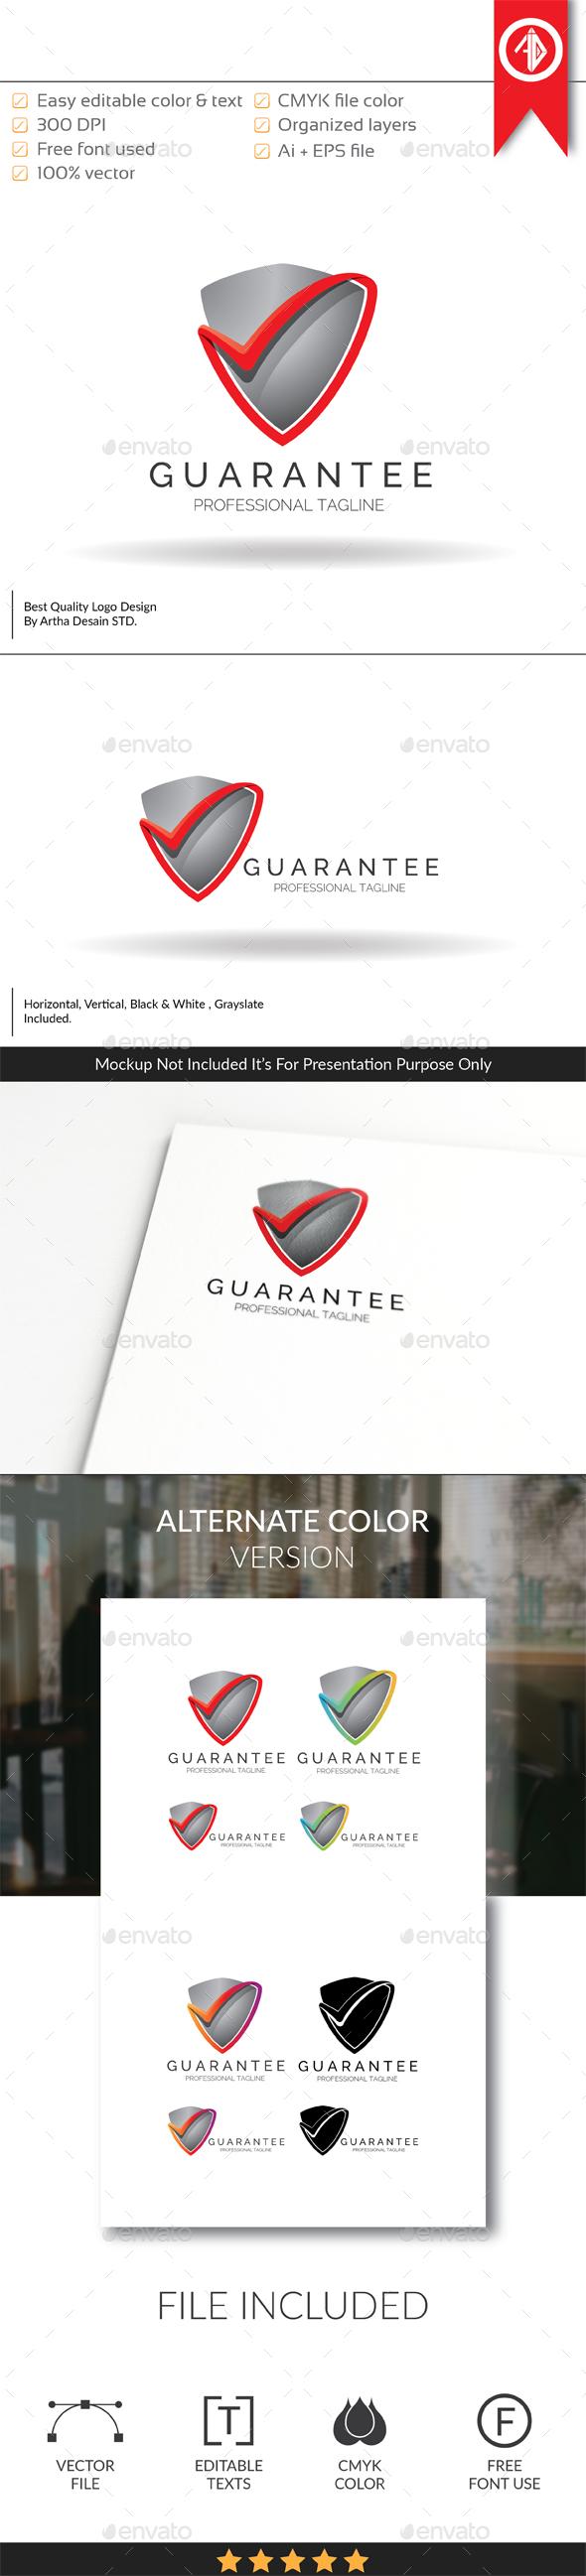 Guarantee / Shield Protection - Logo Template - Symbols Logo Templates